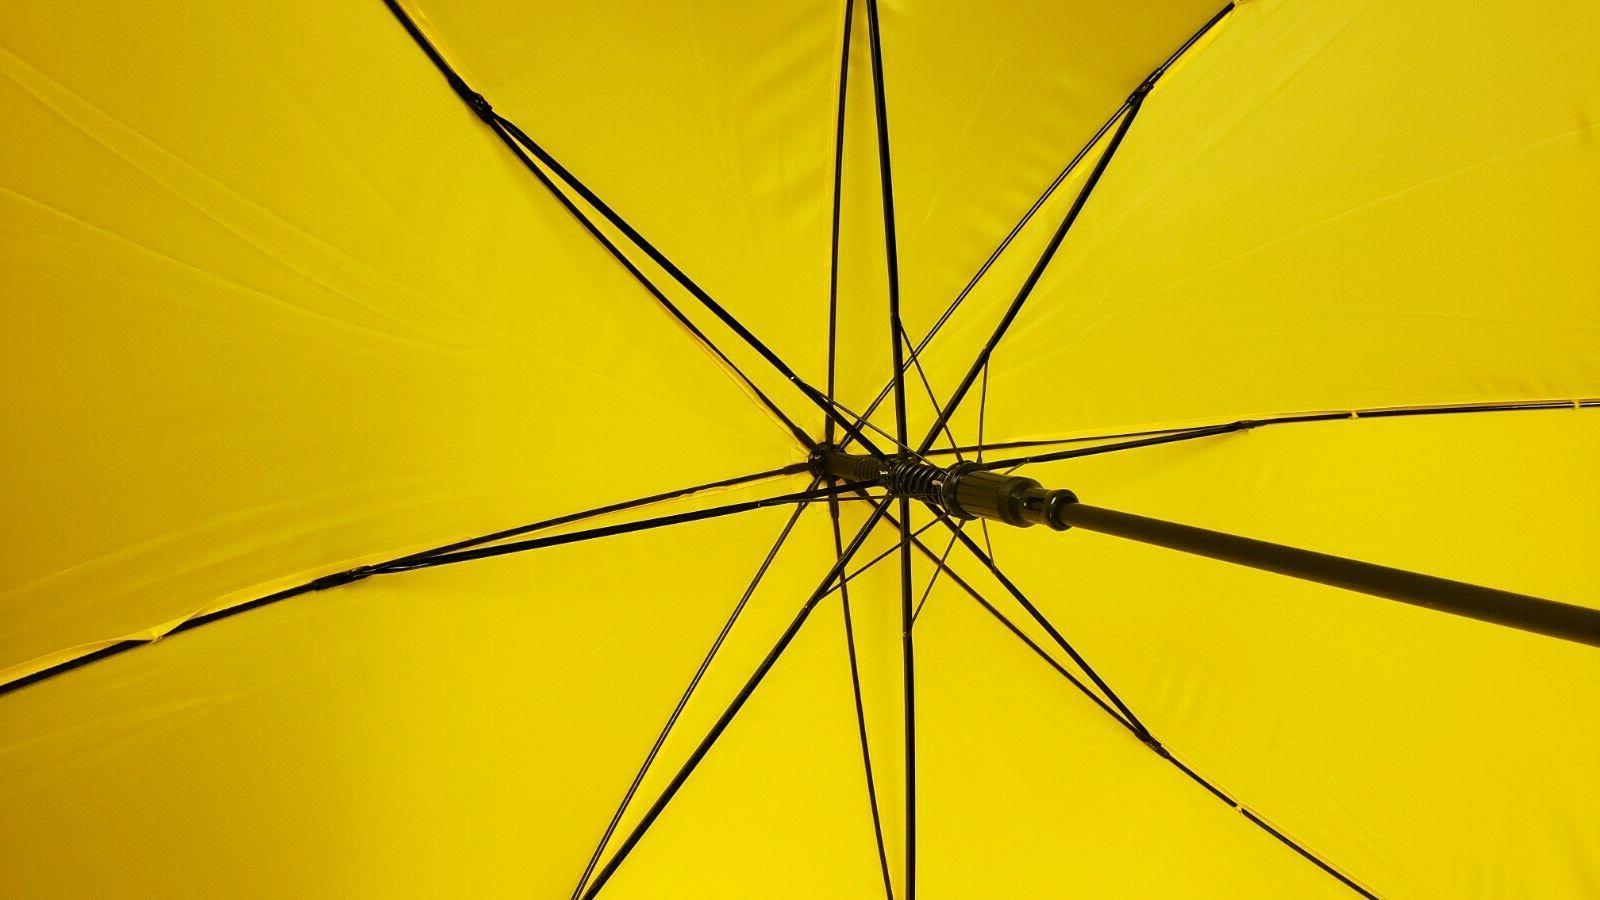 "48"" Handle Umbrella-RainStoppers, Rain/Sun Fashion,Travel"